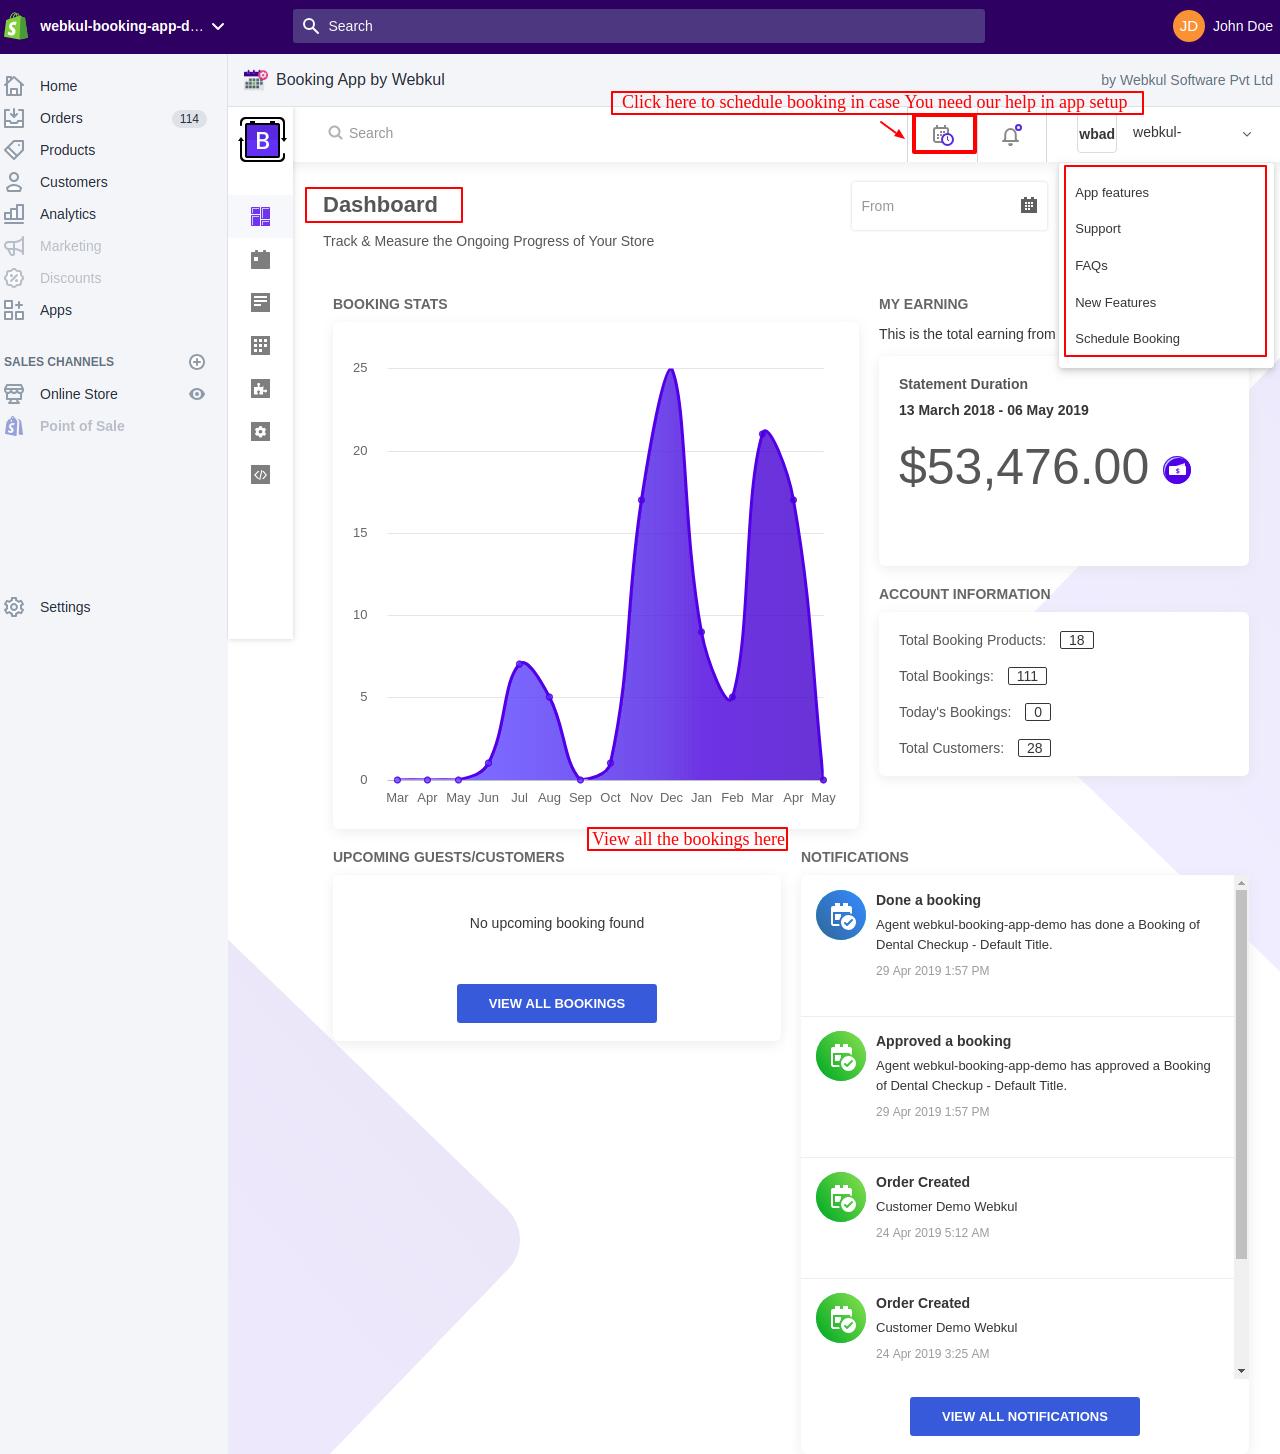 screencapture webkul booking app demo myshopify admin apps booking app by webkul booking management web en app 2019 05 06 16_08_47